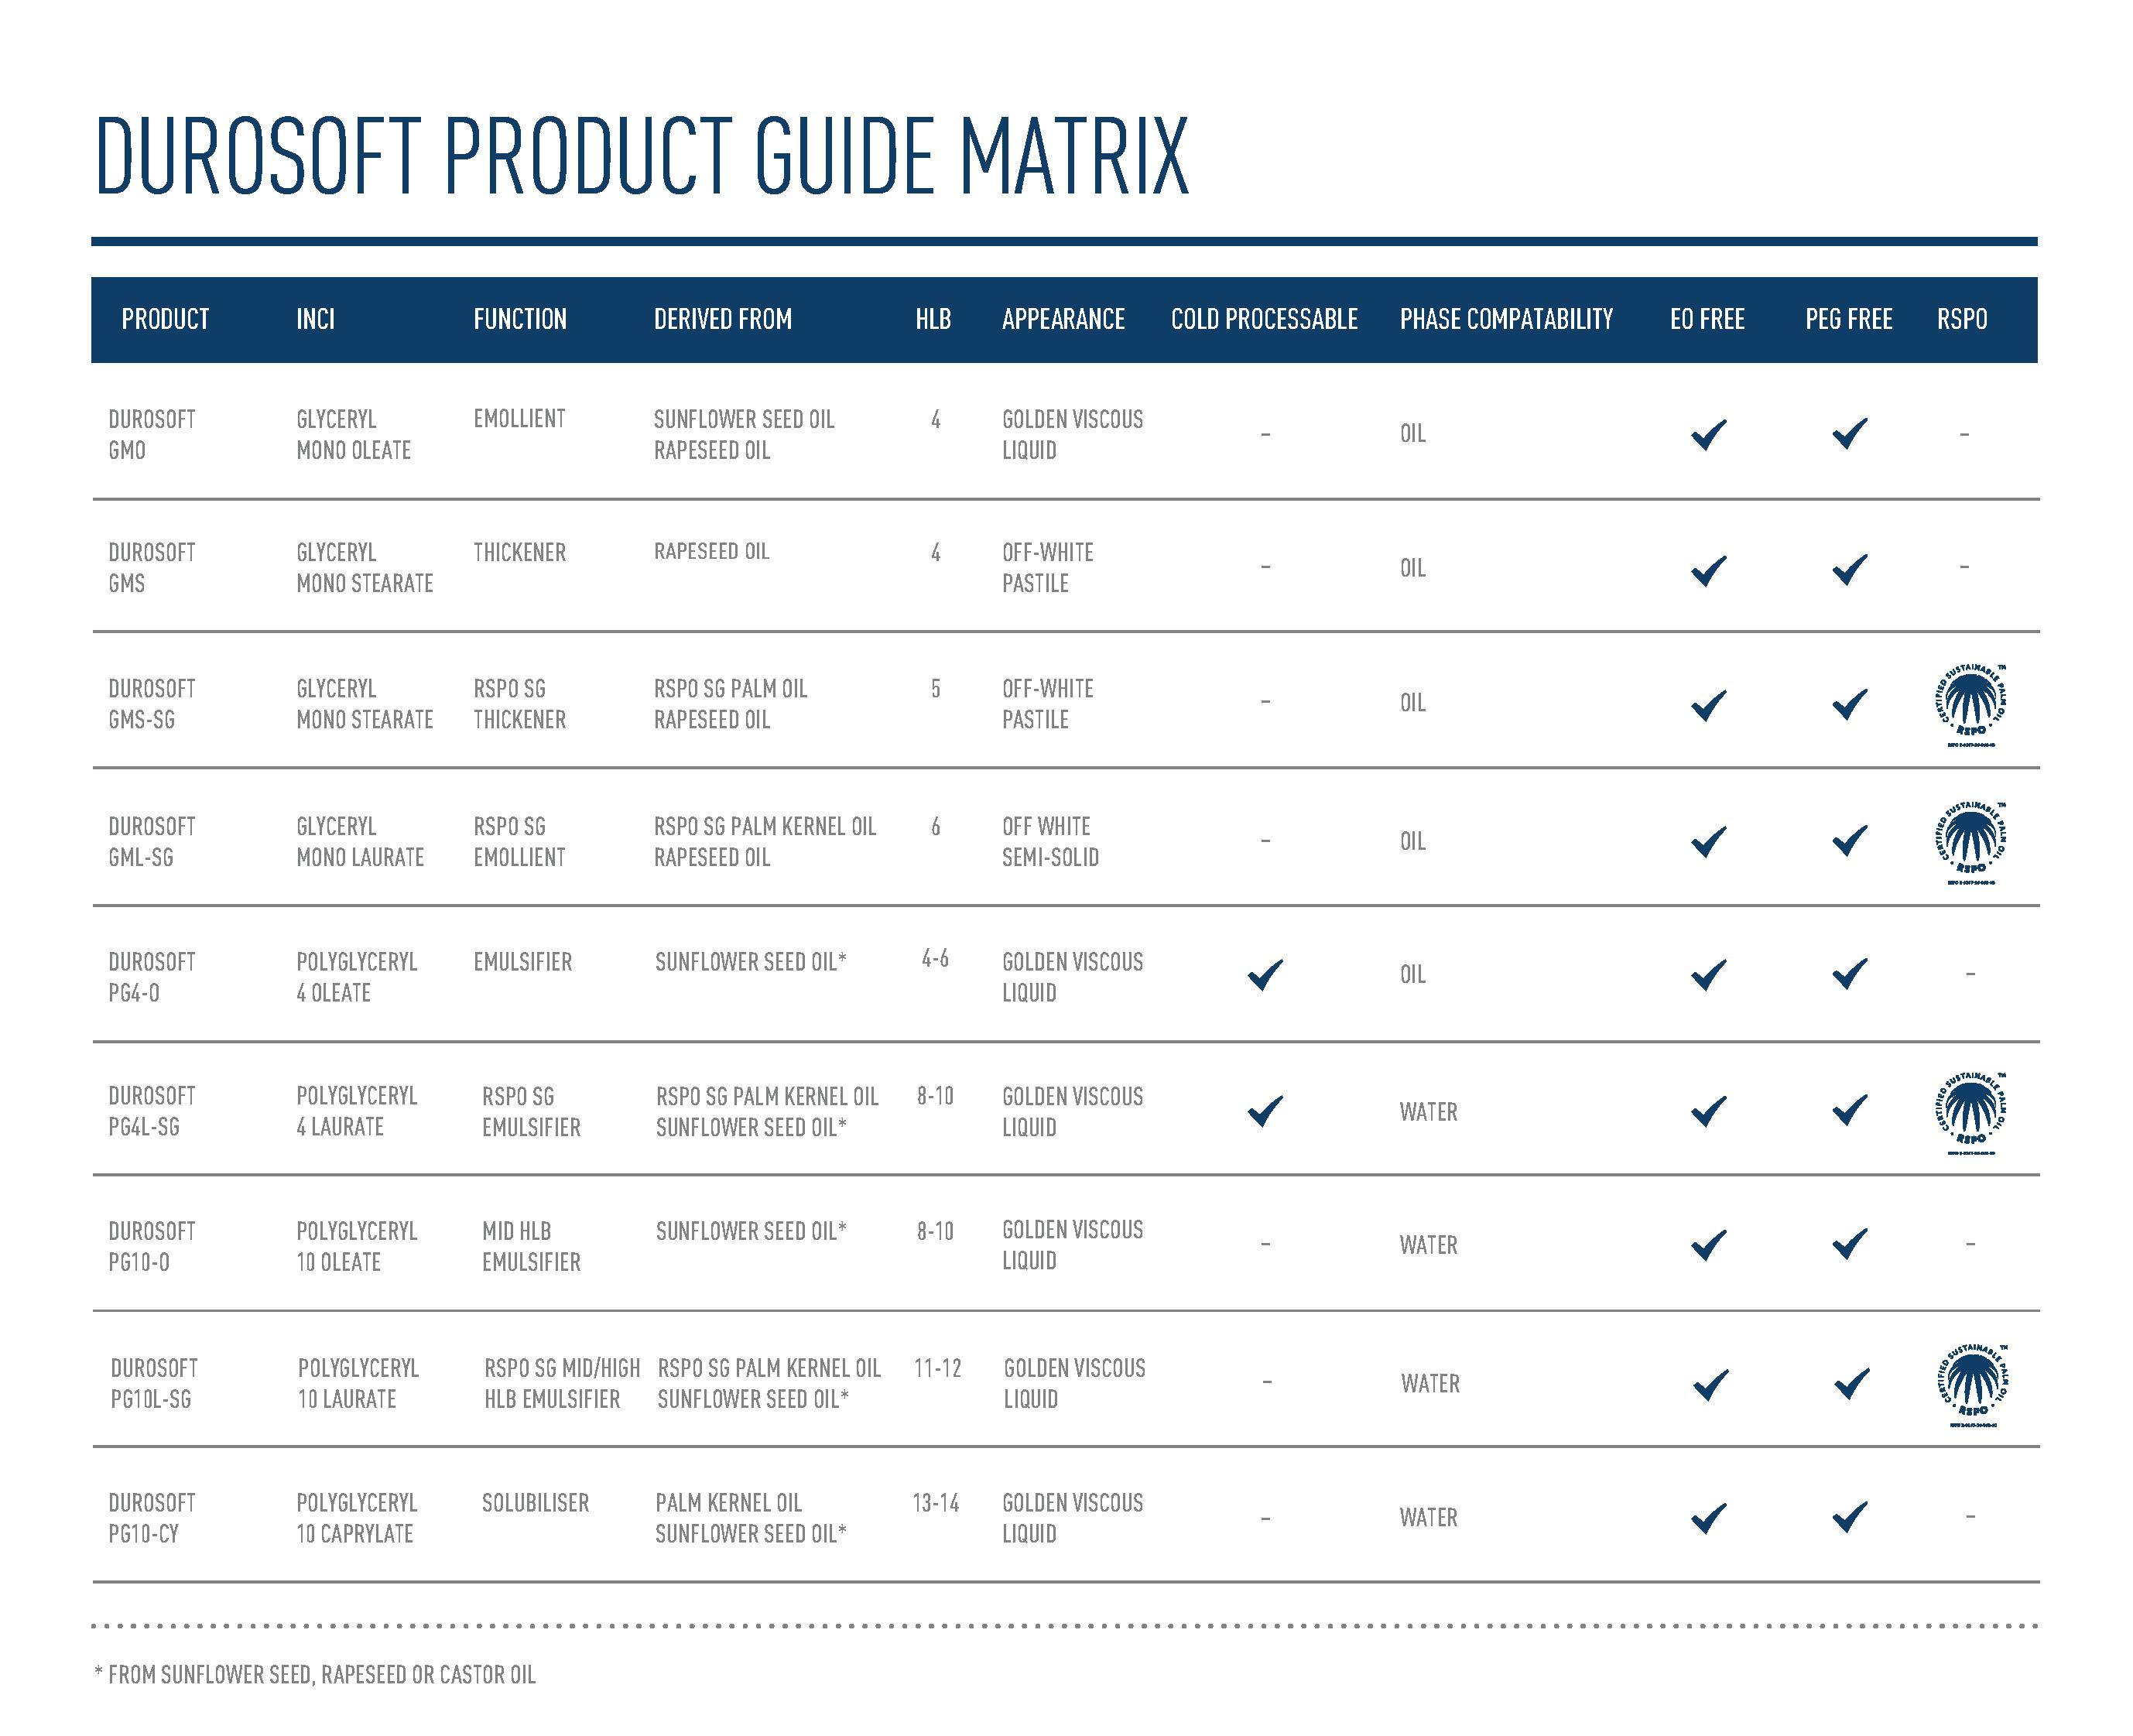 STEPHENSON DUROSOFT Product Matrix